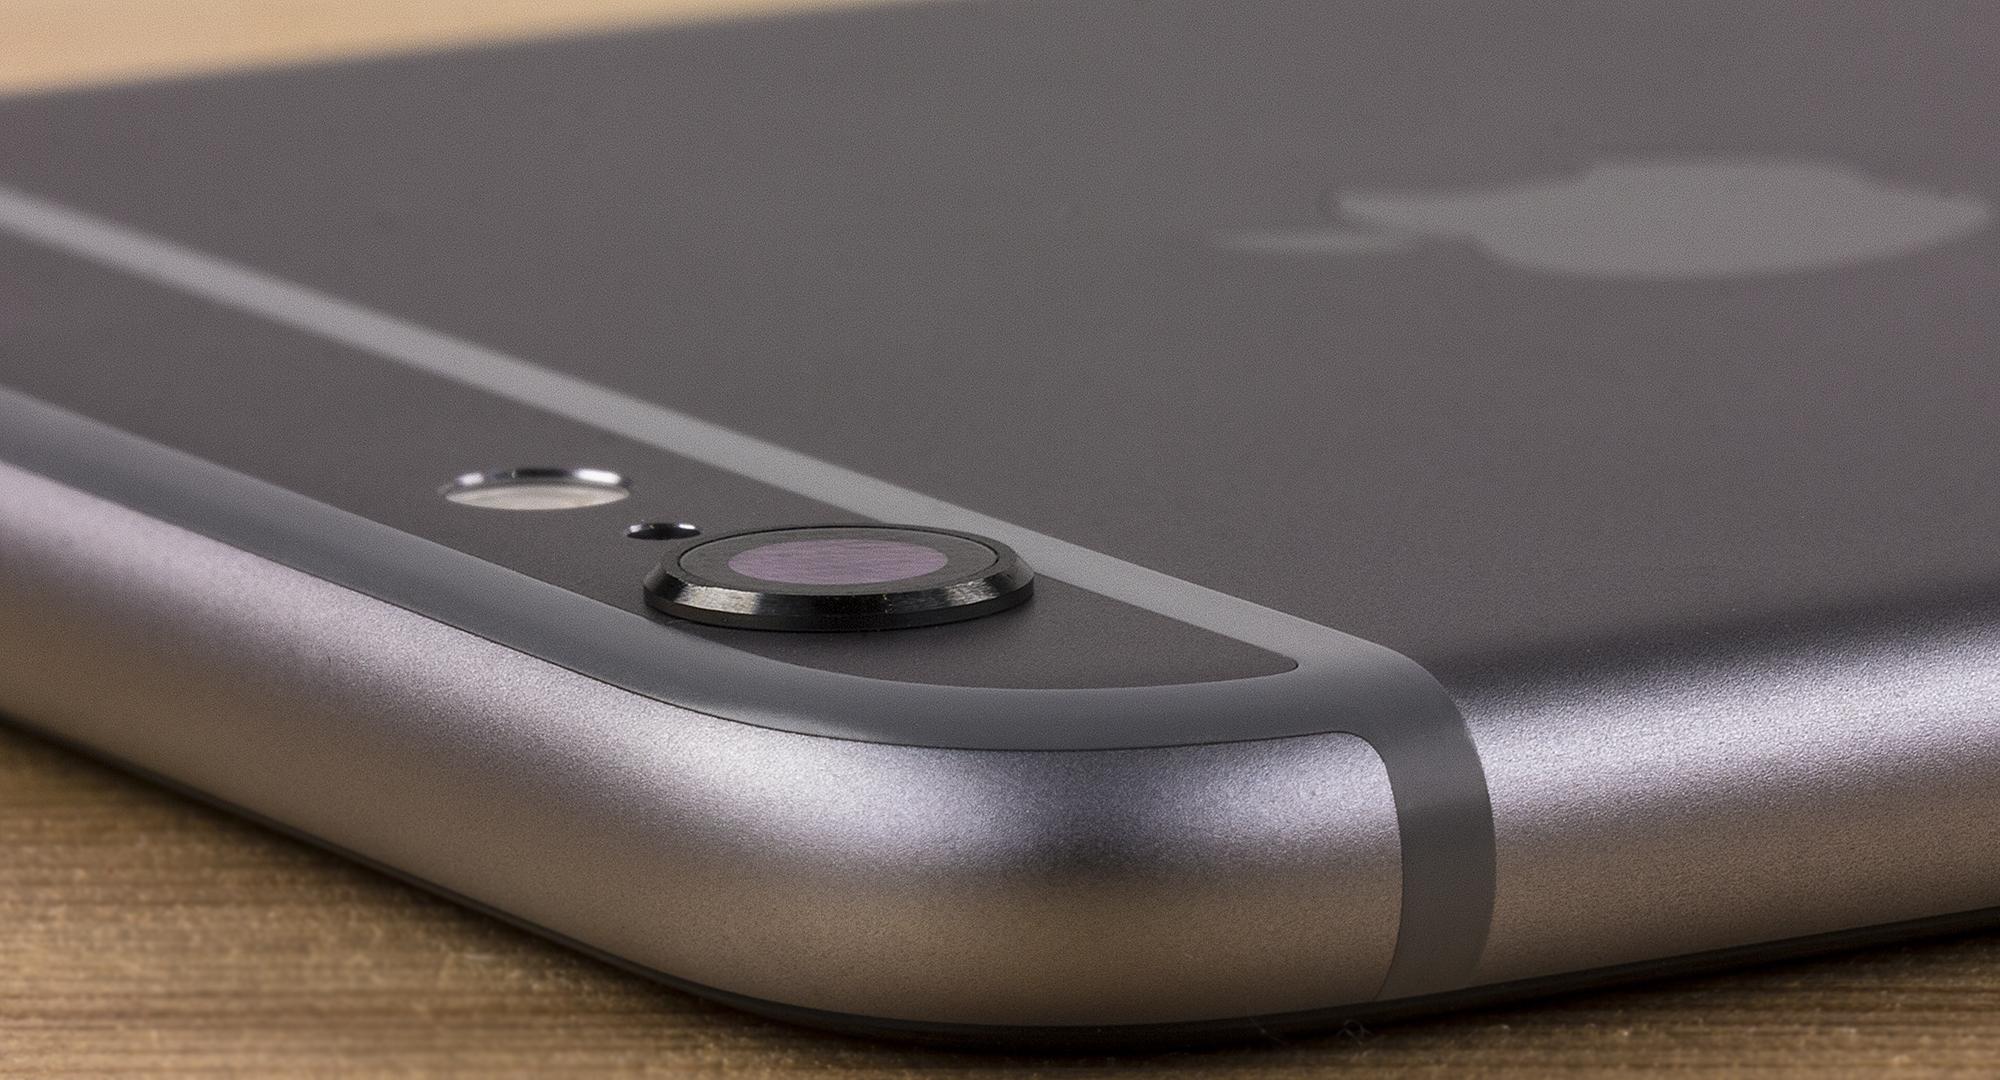 Дизайн как у iphone